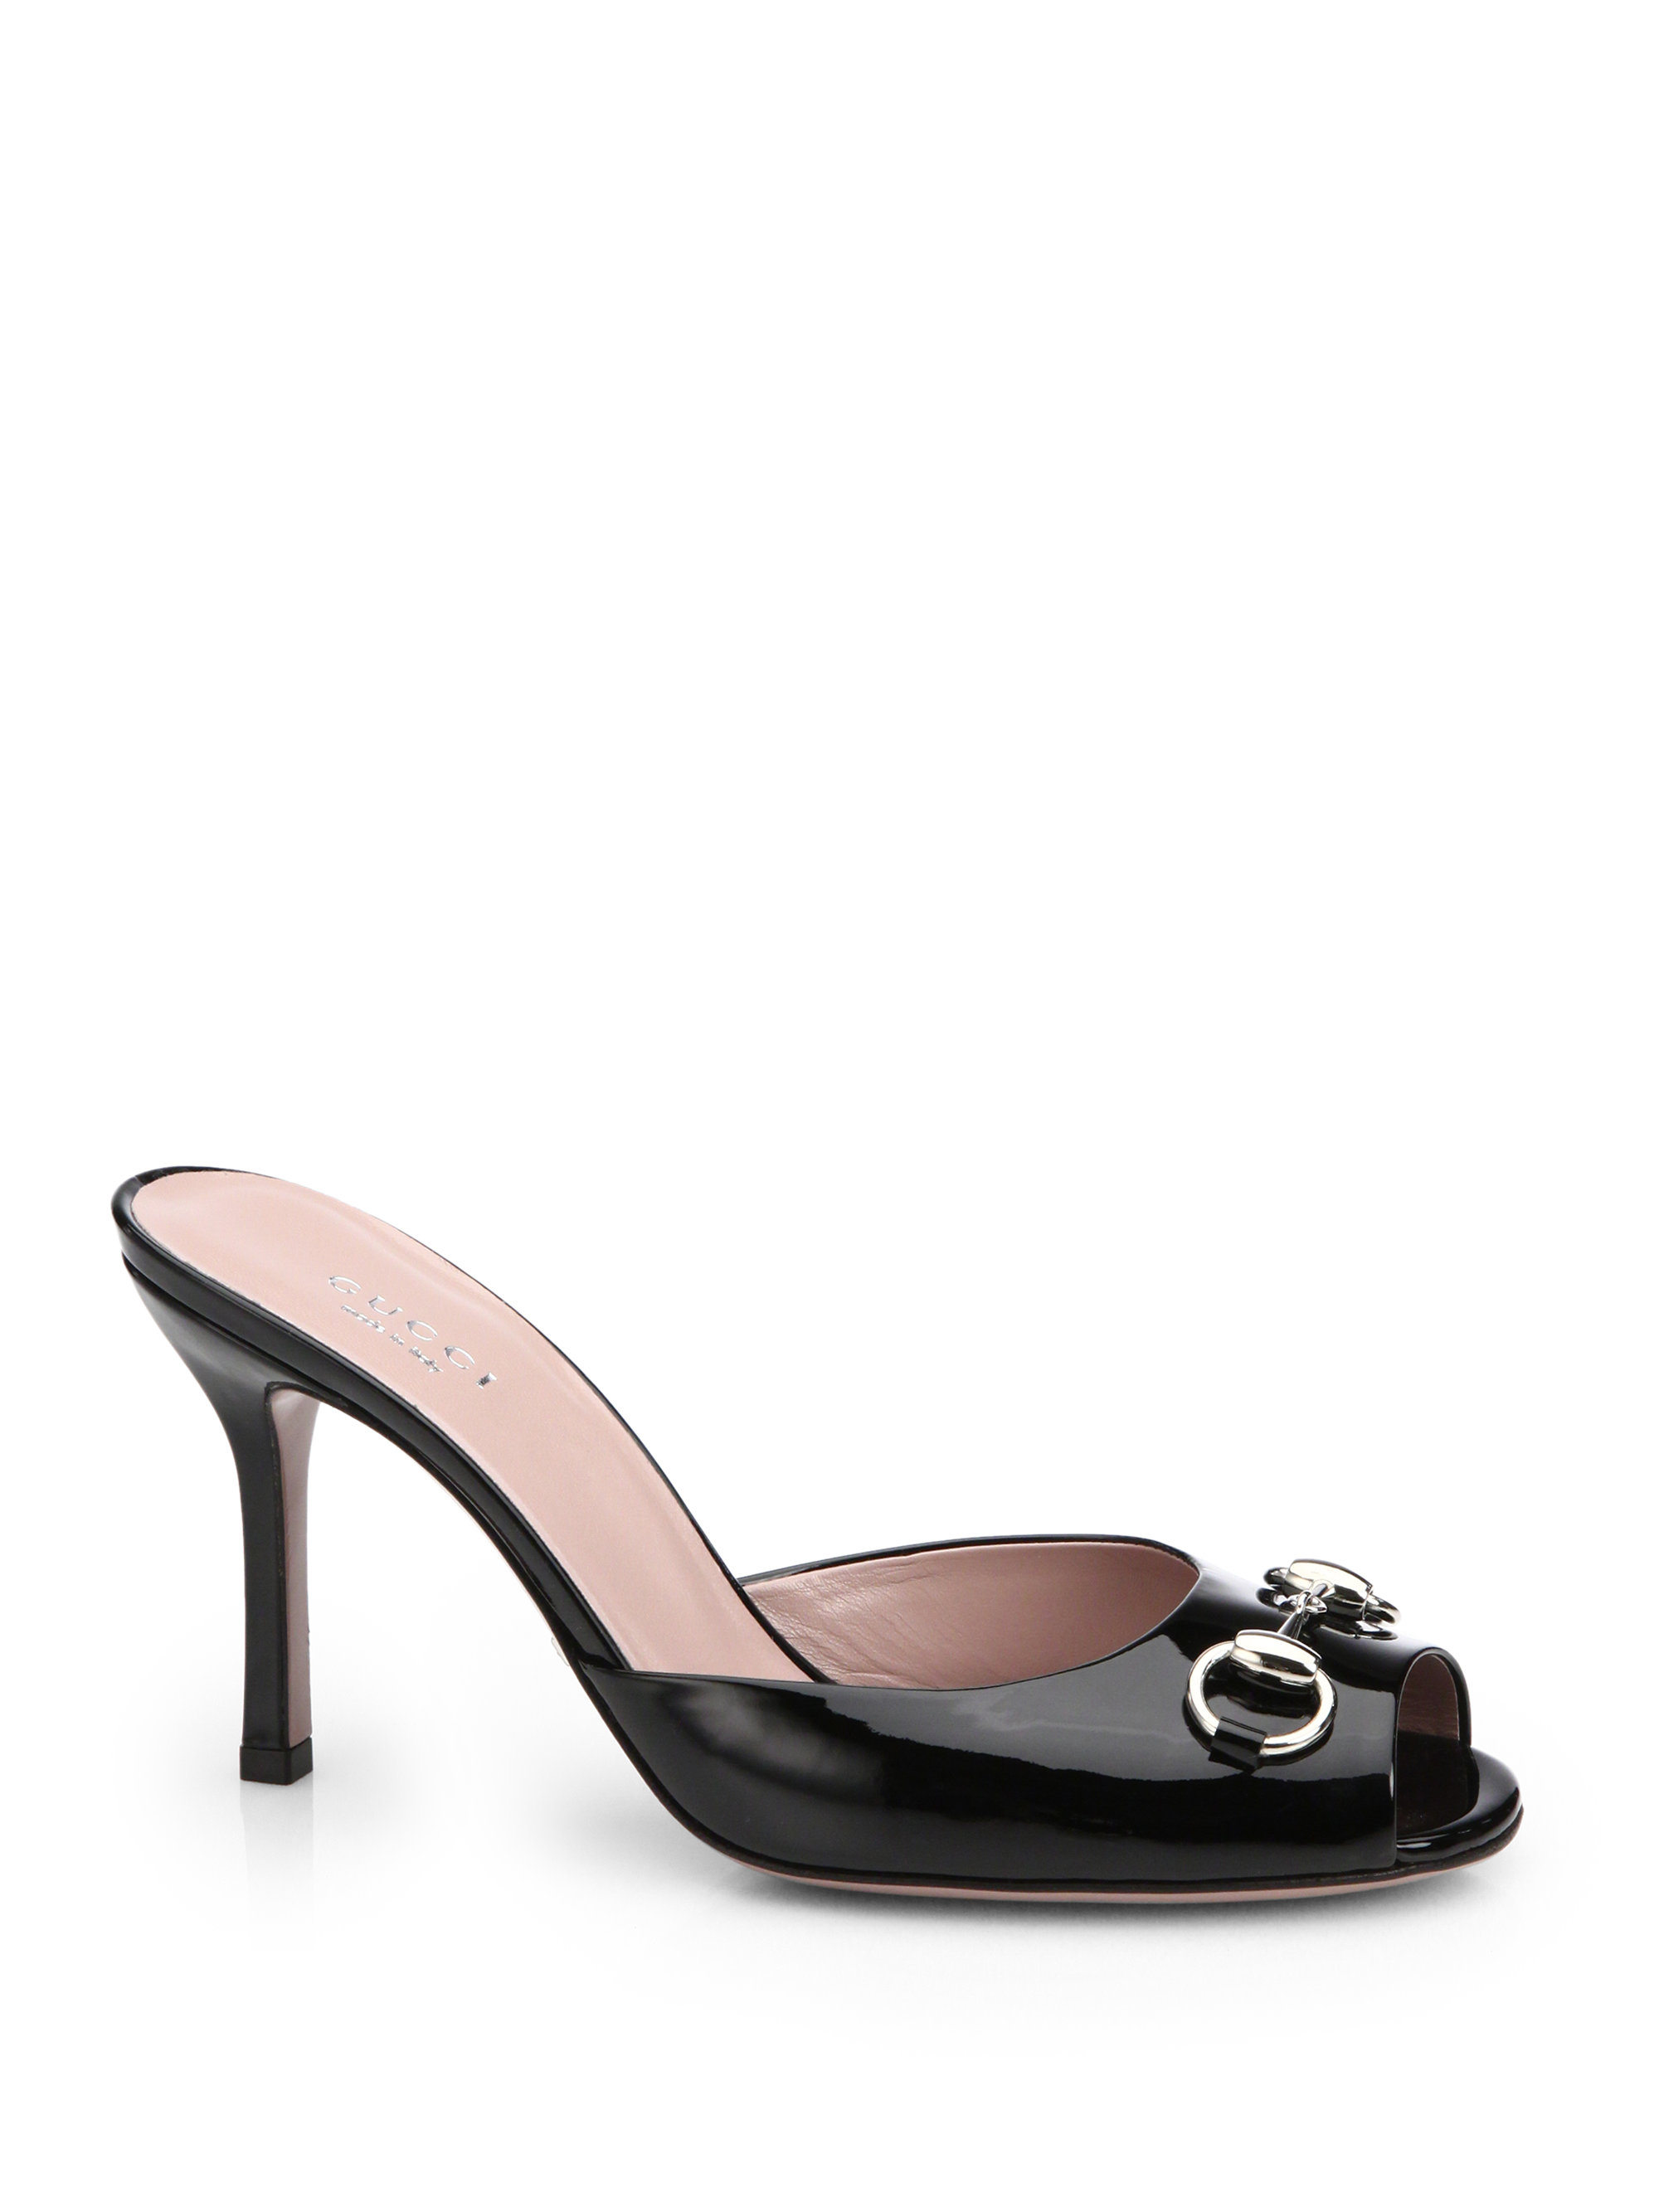 Lyst - Gucci Jolene Leather Mule Sandals in Black bd05100e88